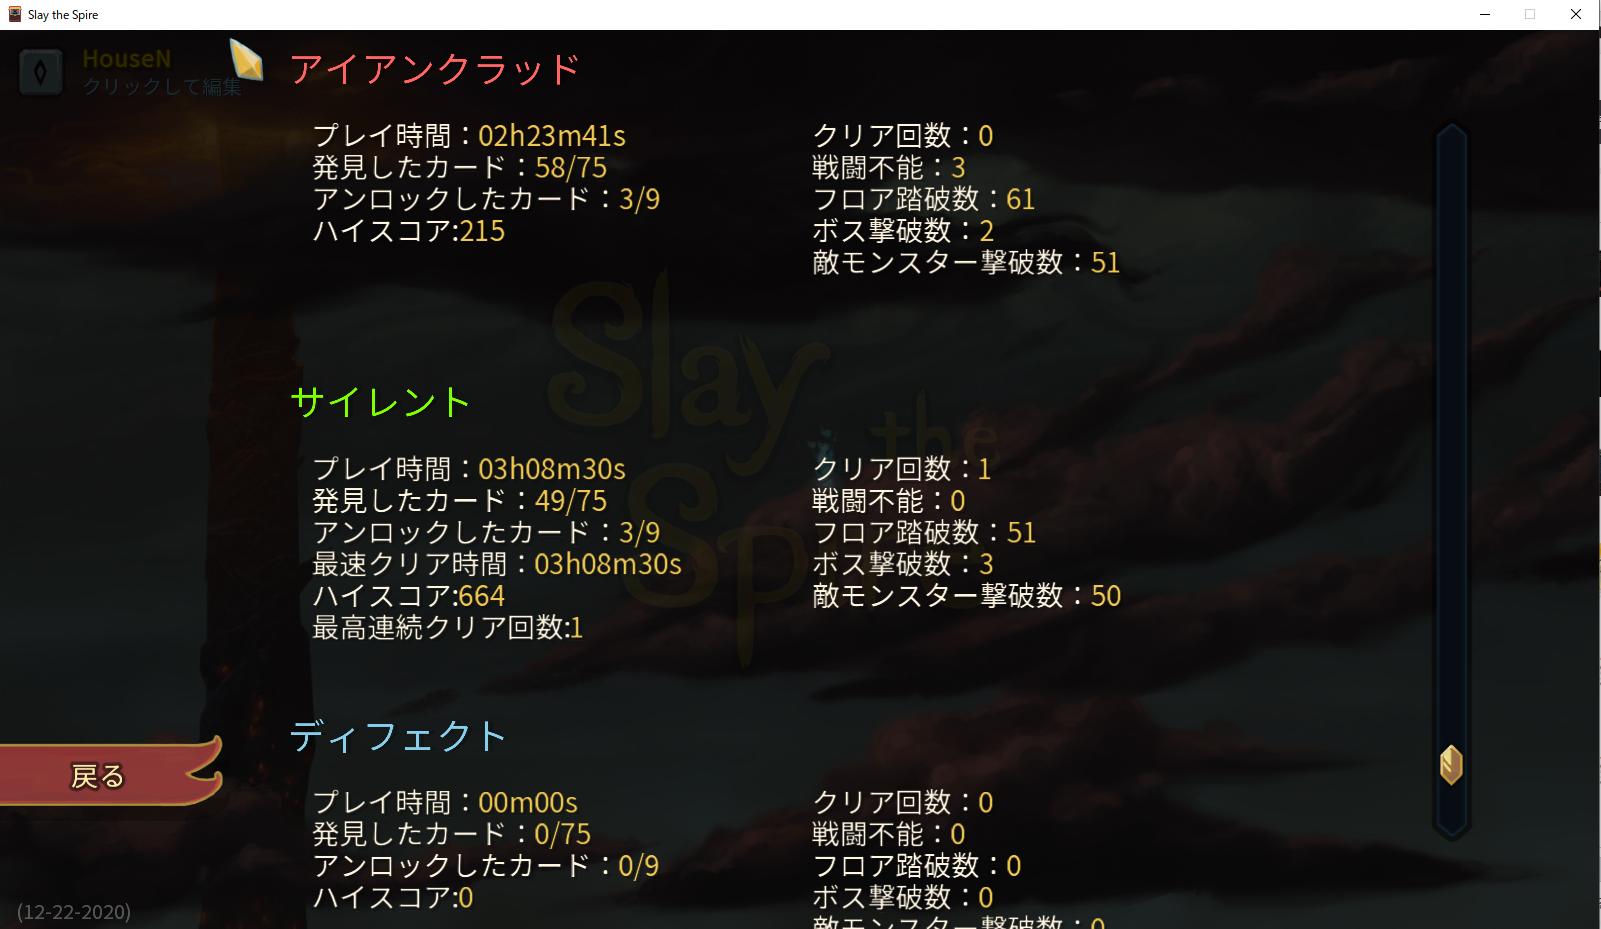 f:id:himajin-mode:20201224224957p:plain